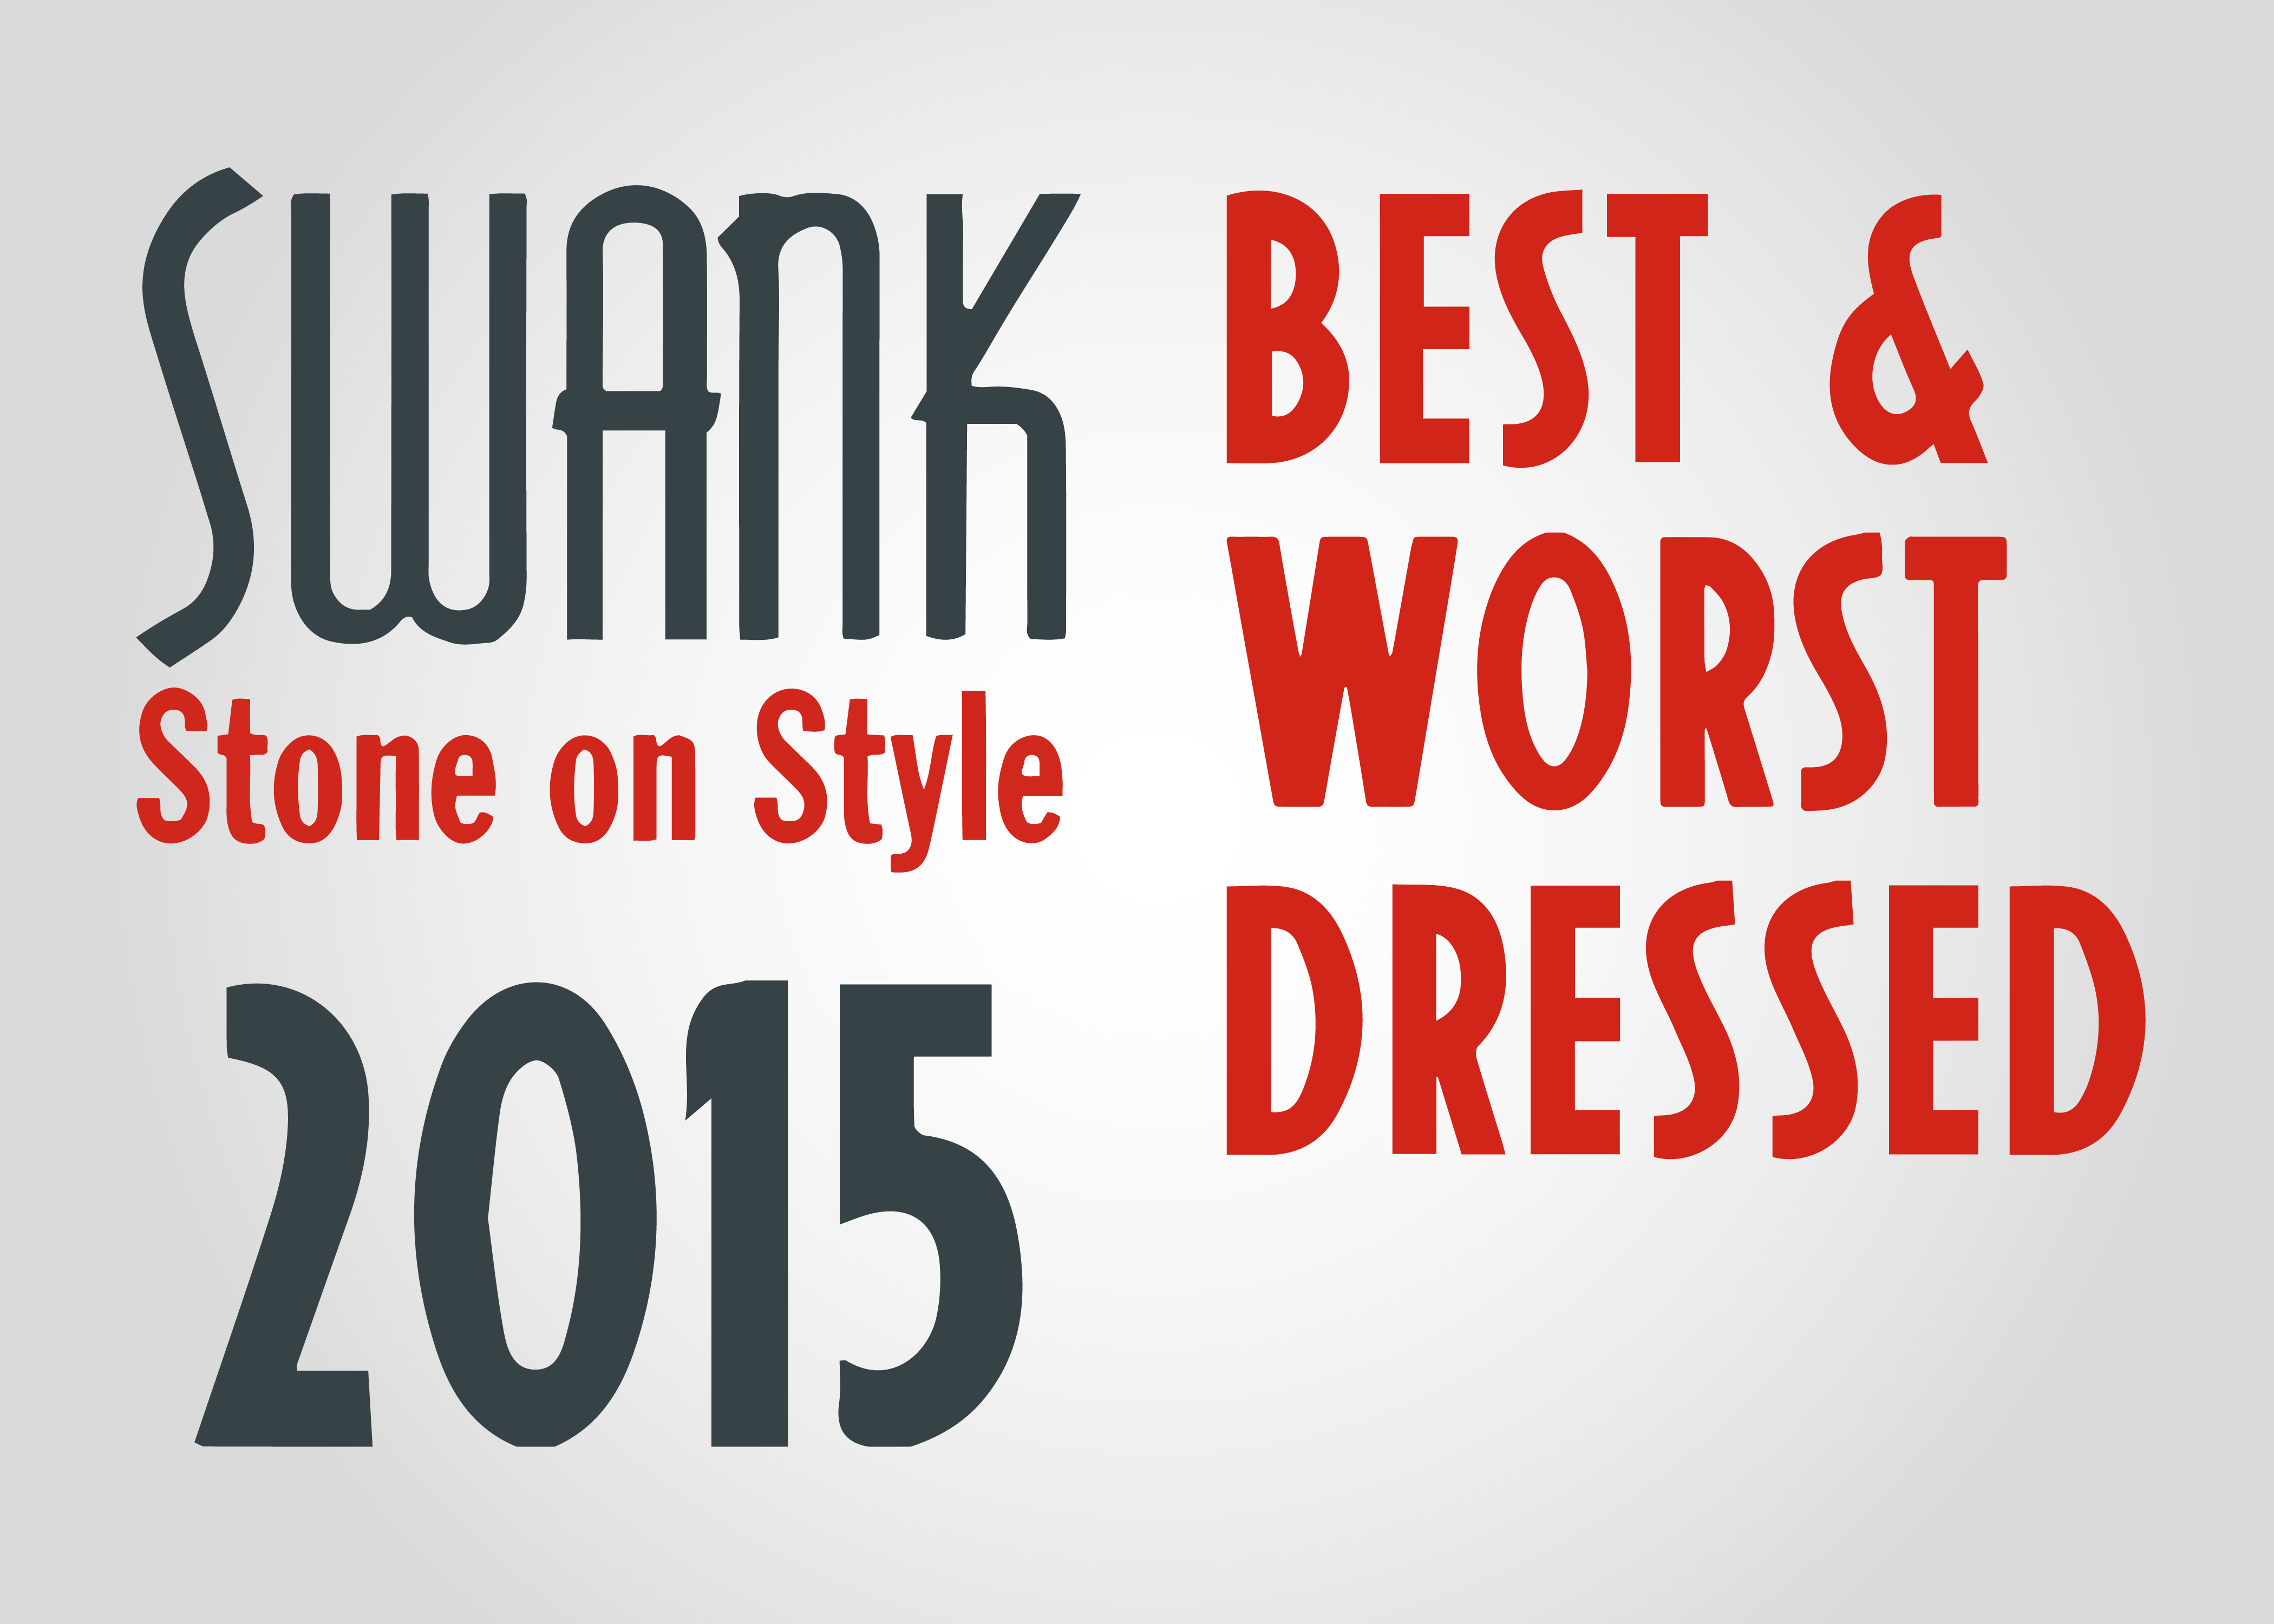 swank2015-01